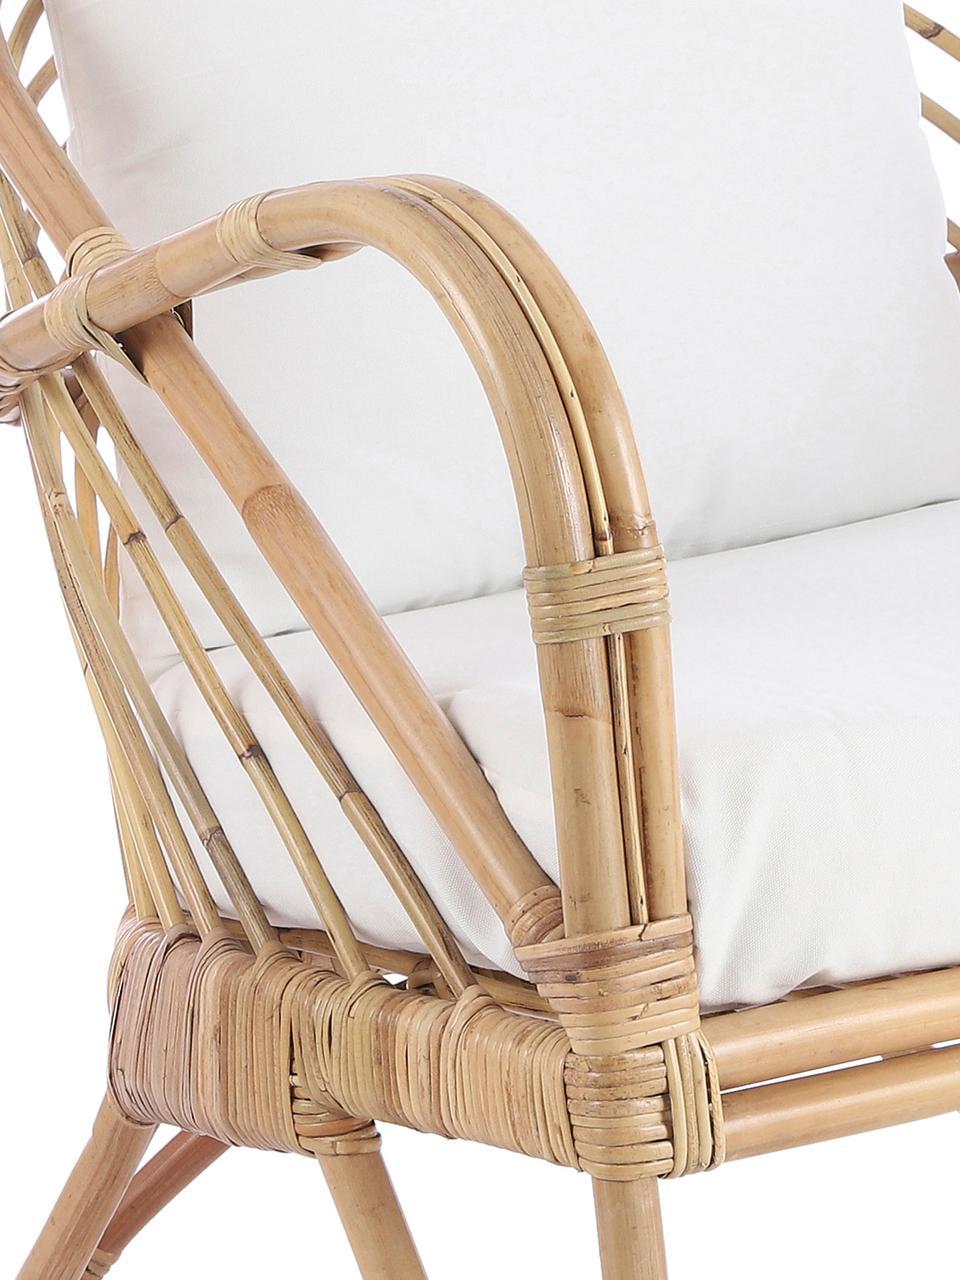 Rattan-Loungesessel Rochester, Gestell: Rattan, Bezug: Polyester, Rattan, Weiß, B 75 x T 80 cm